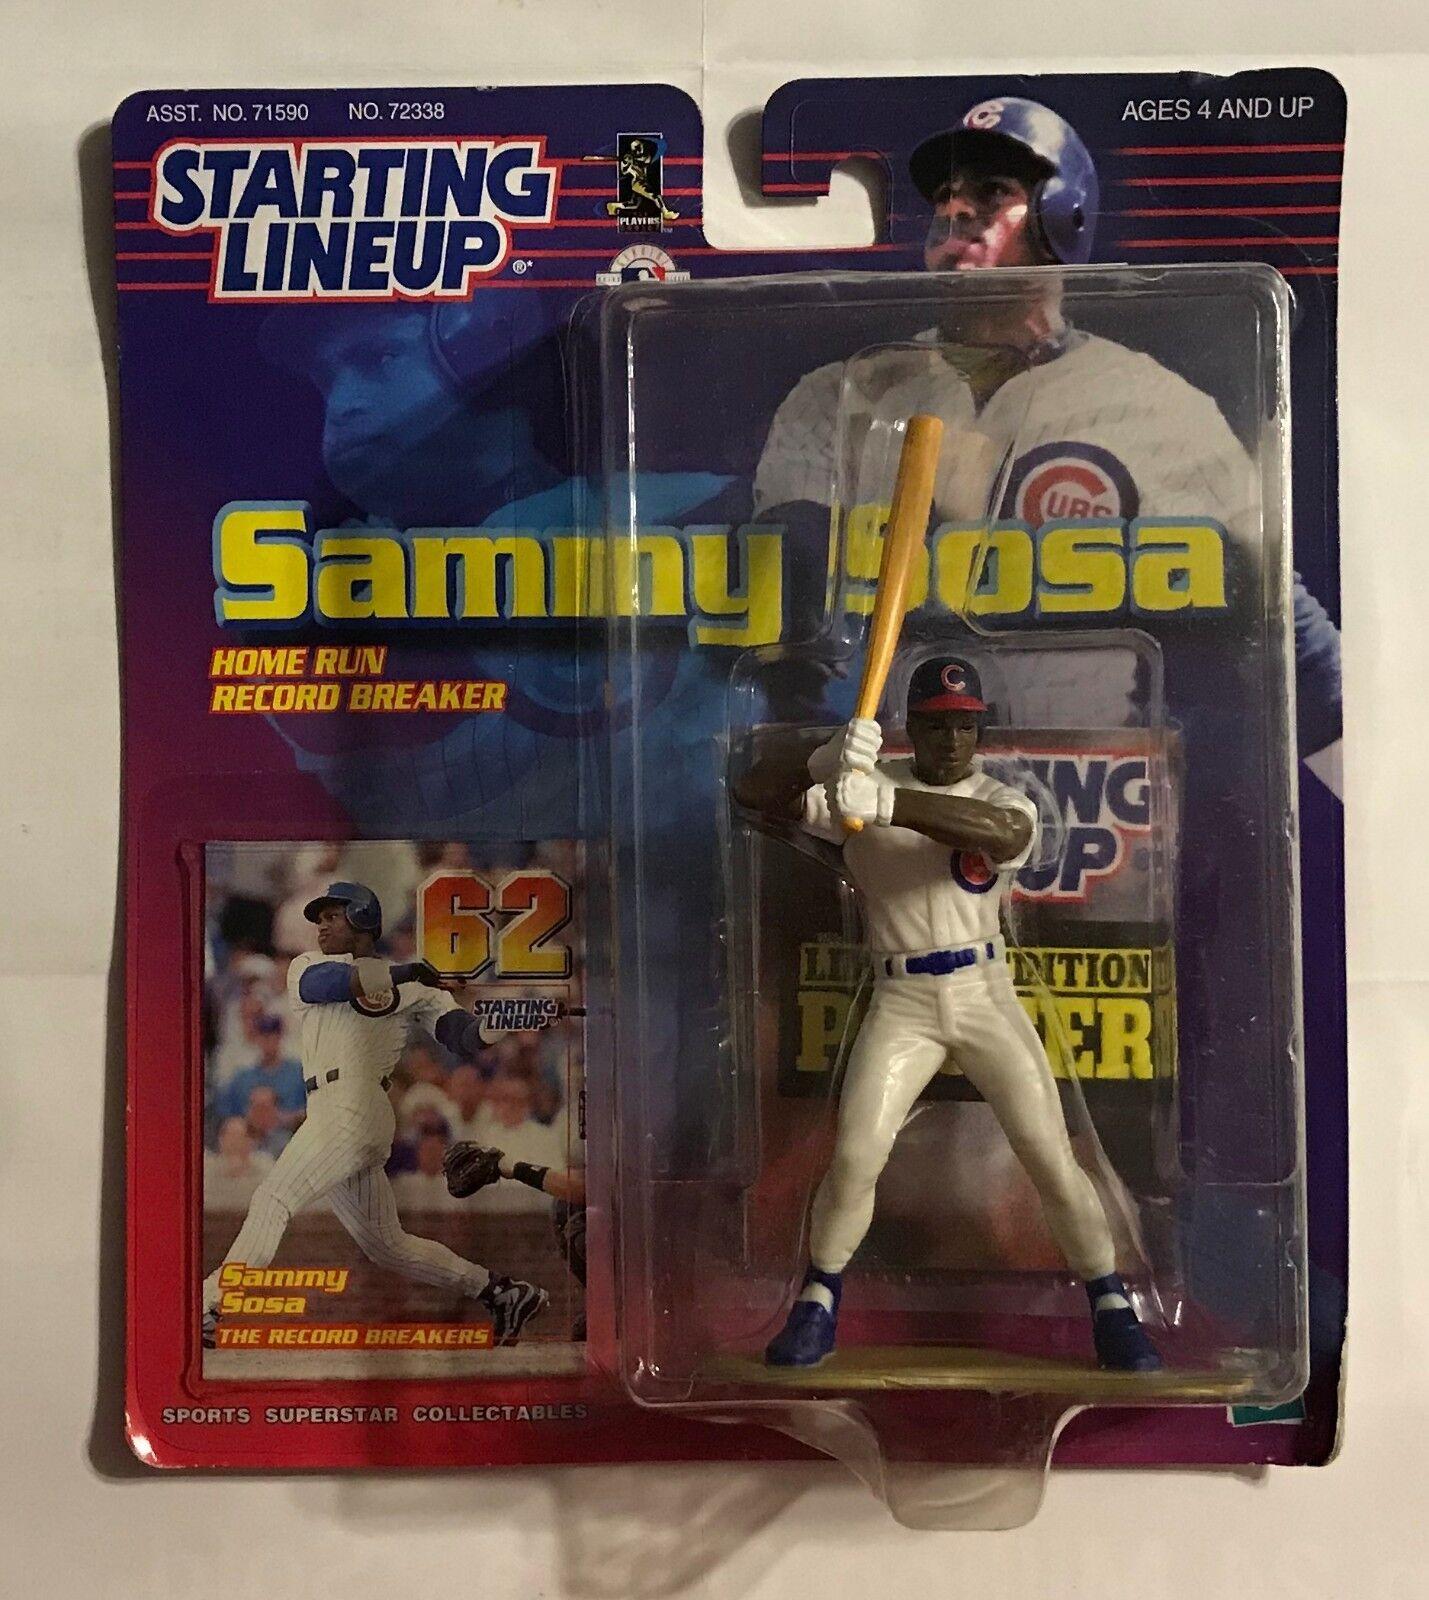 1999 STARTING LINEUP - SAMMY SAMMY SAMMY SOSA - 62 HOME RUNS - ACTION FIGURE a8d6e7